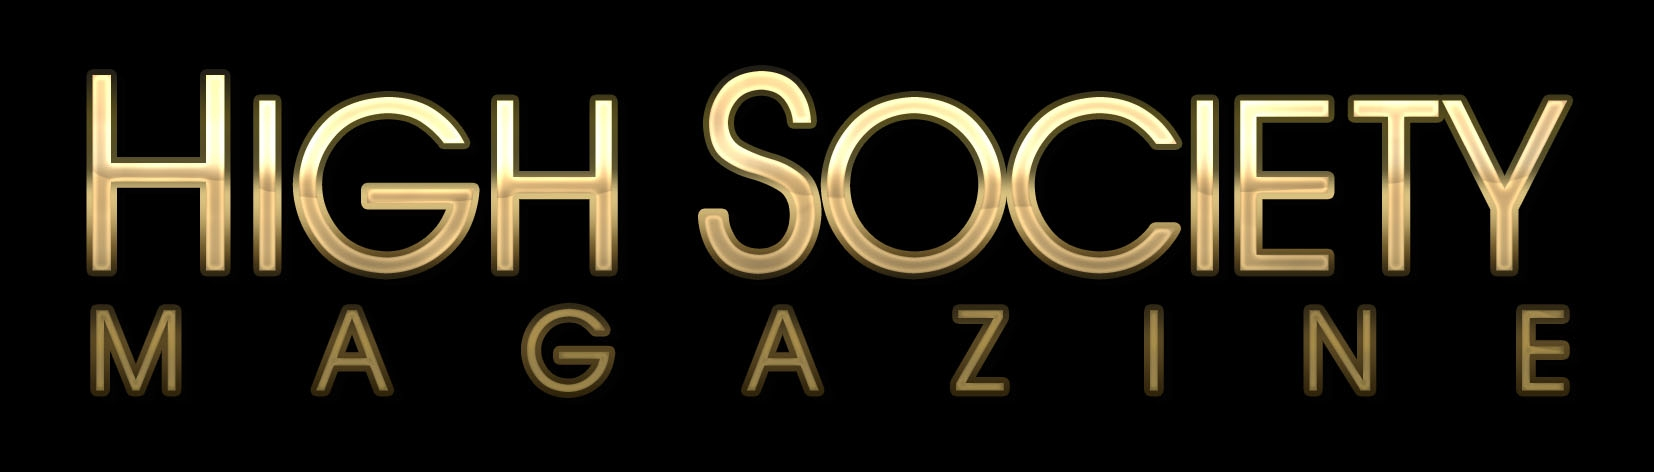 Luxury-HighSocietyMagazine (@luxury-highsocietymagazine) Cover Image